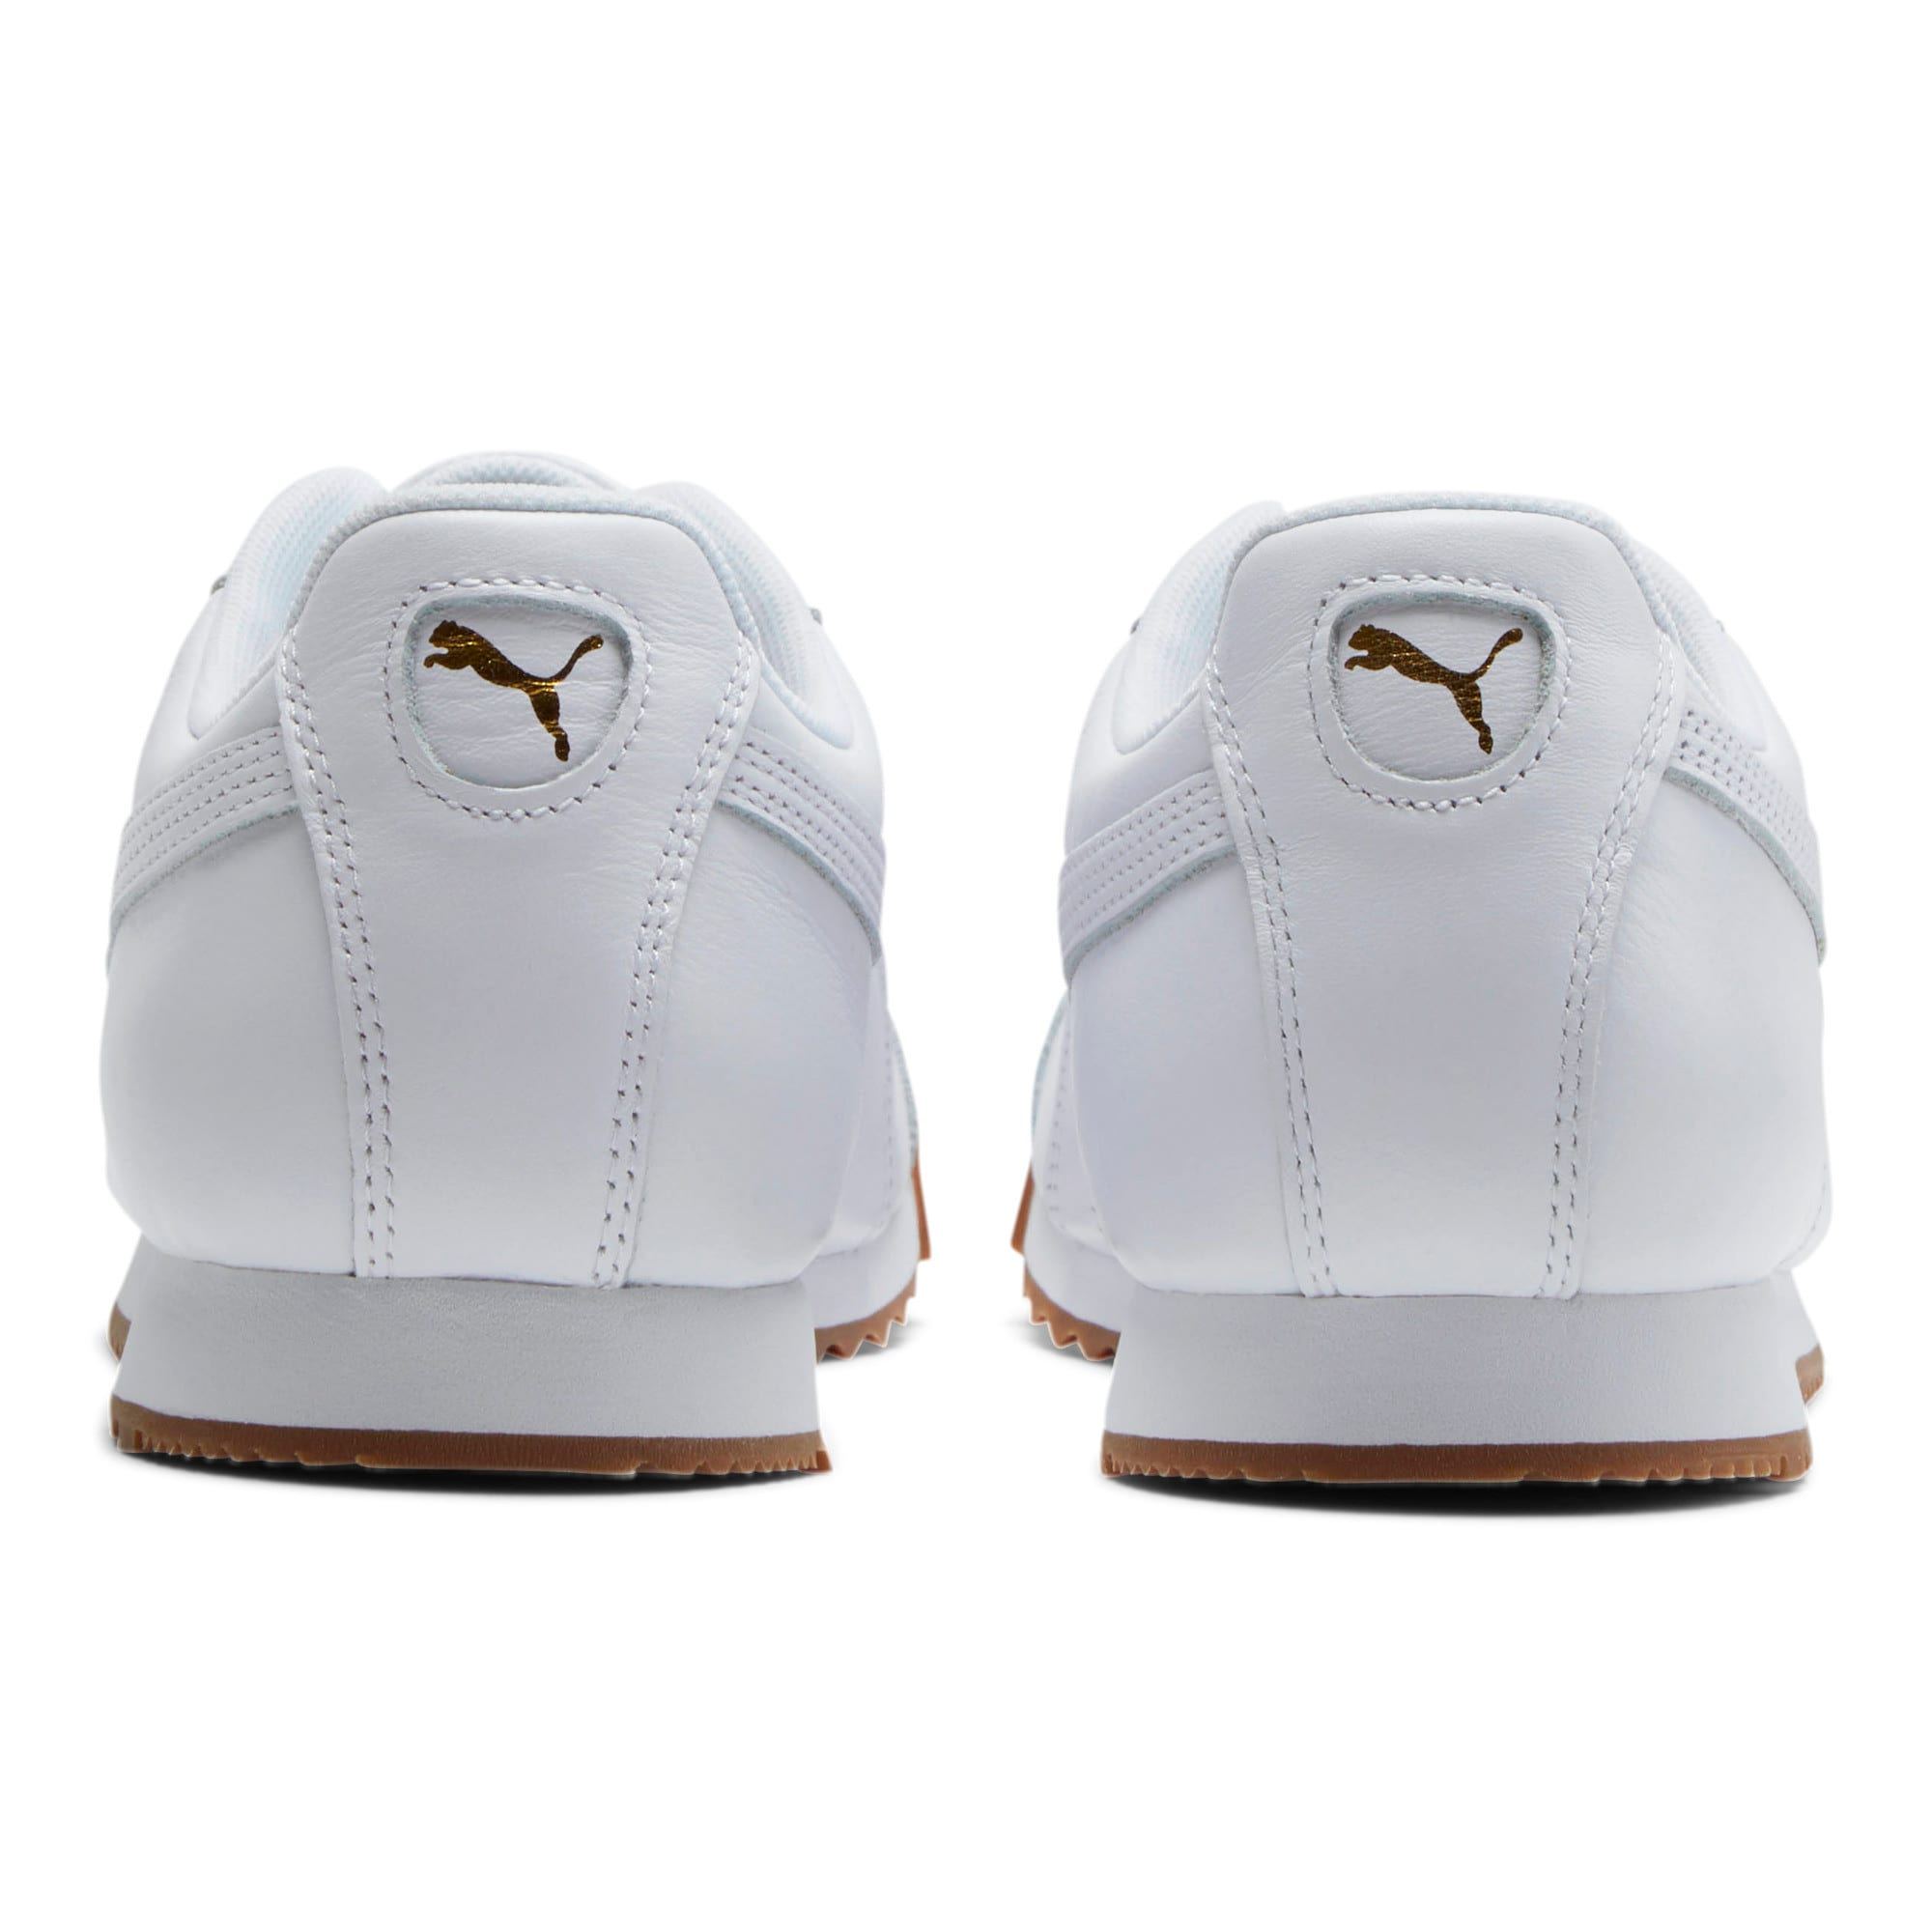 Thumbnail 3 of Roma Classic Gum Sneakers, Puma White-Puma Team Gold, medium